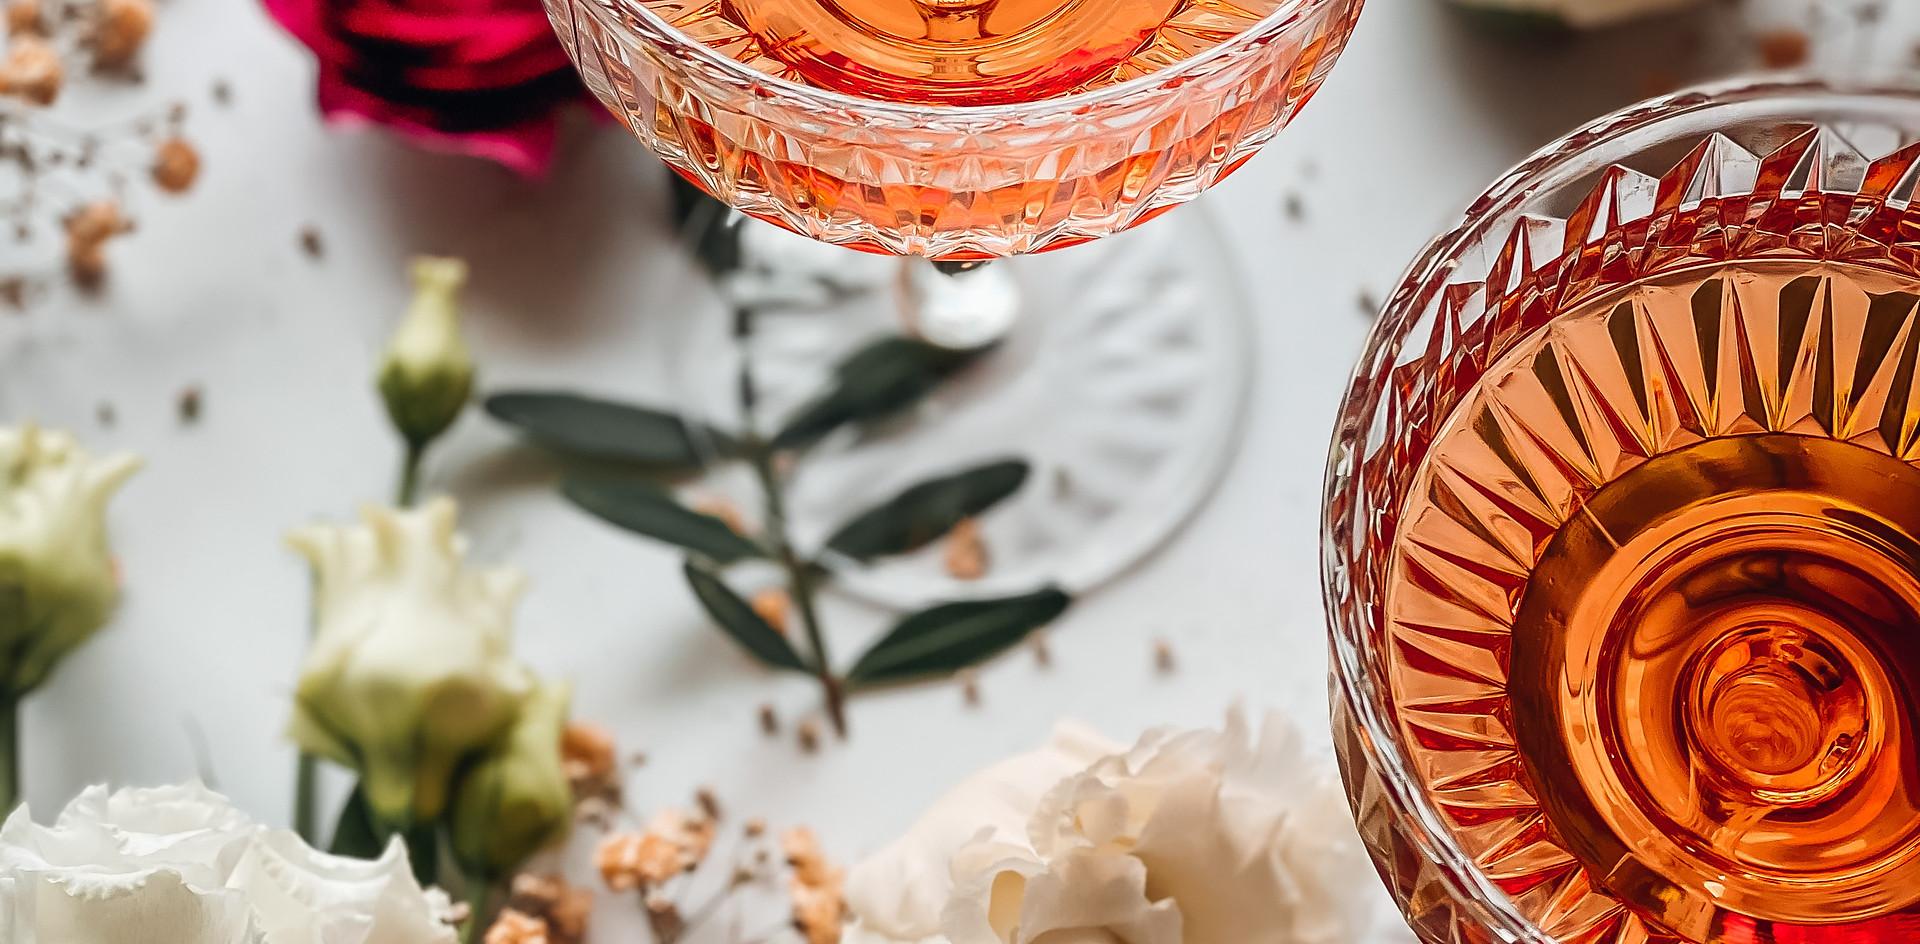 Talavas-rose-sidrs-kirsu